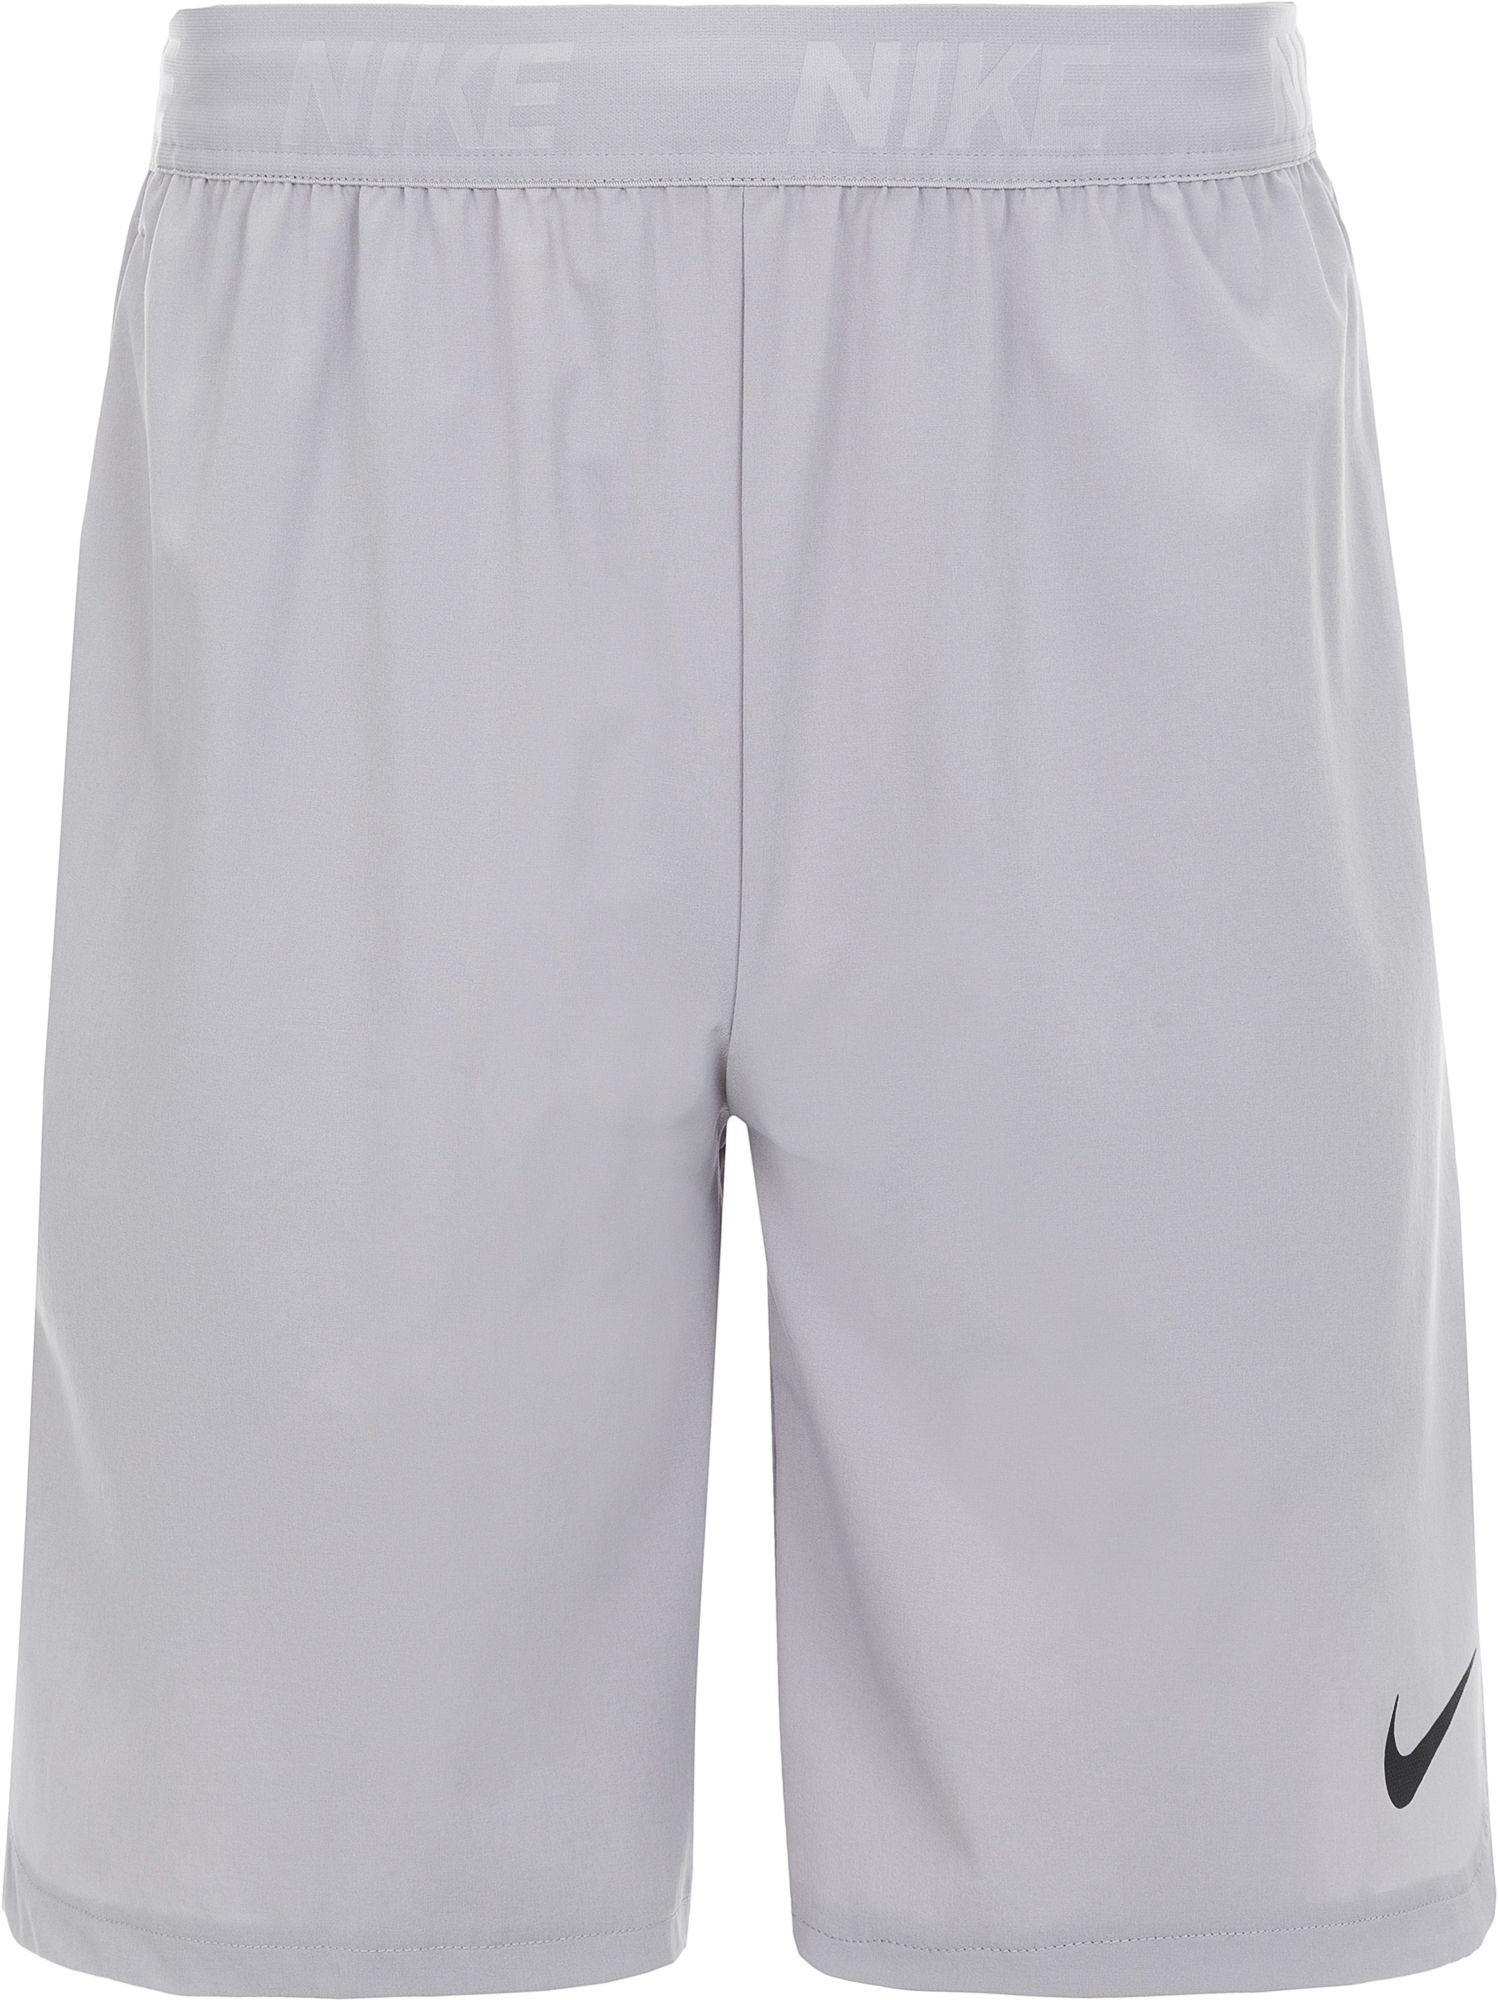 Nike Шорты мужские Nike Flex, размер 50-52 цены онлайн